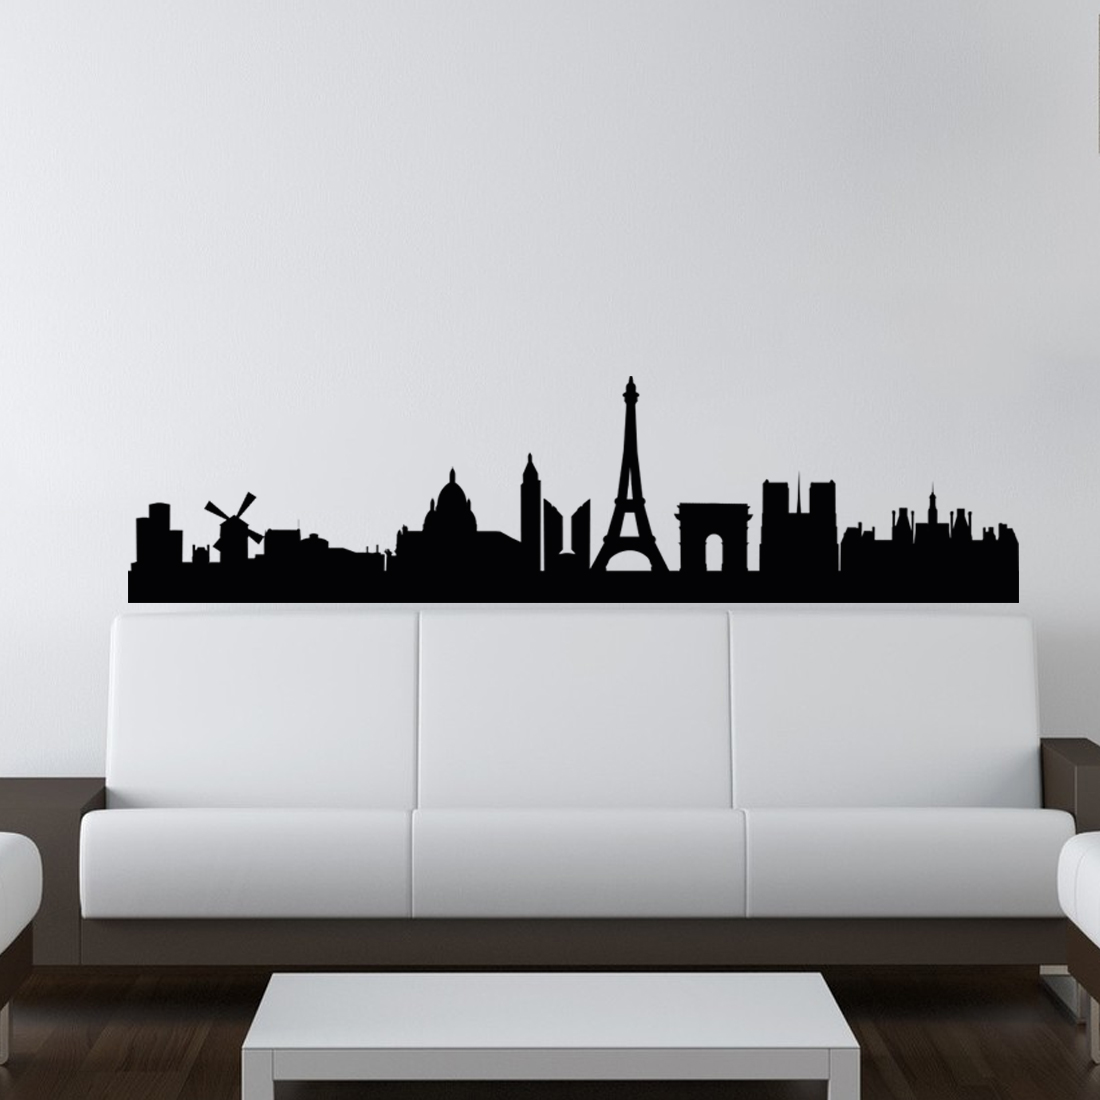 Muursticker Parijs Skyline - al vanaf €15,00 - Muurstickerstunter